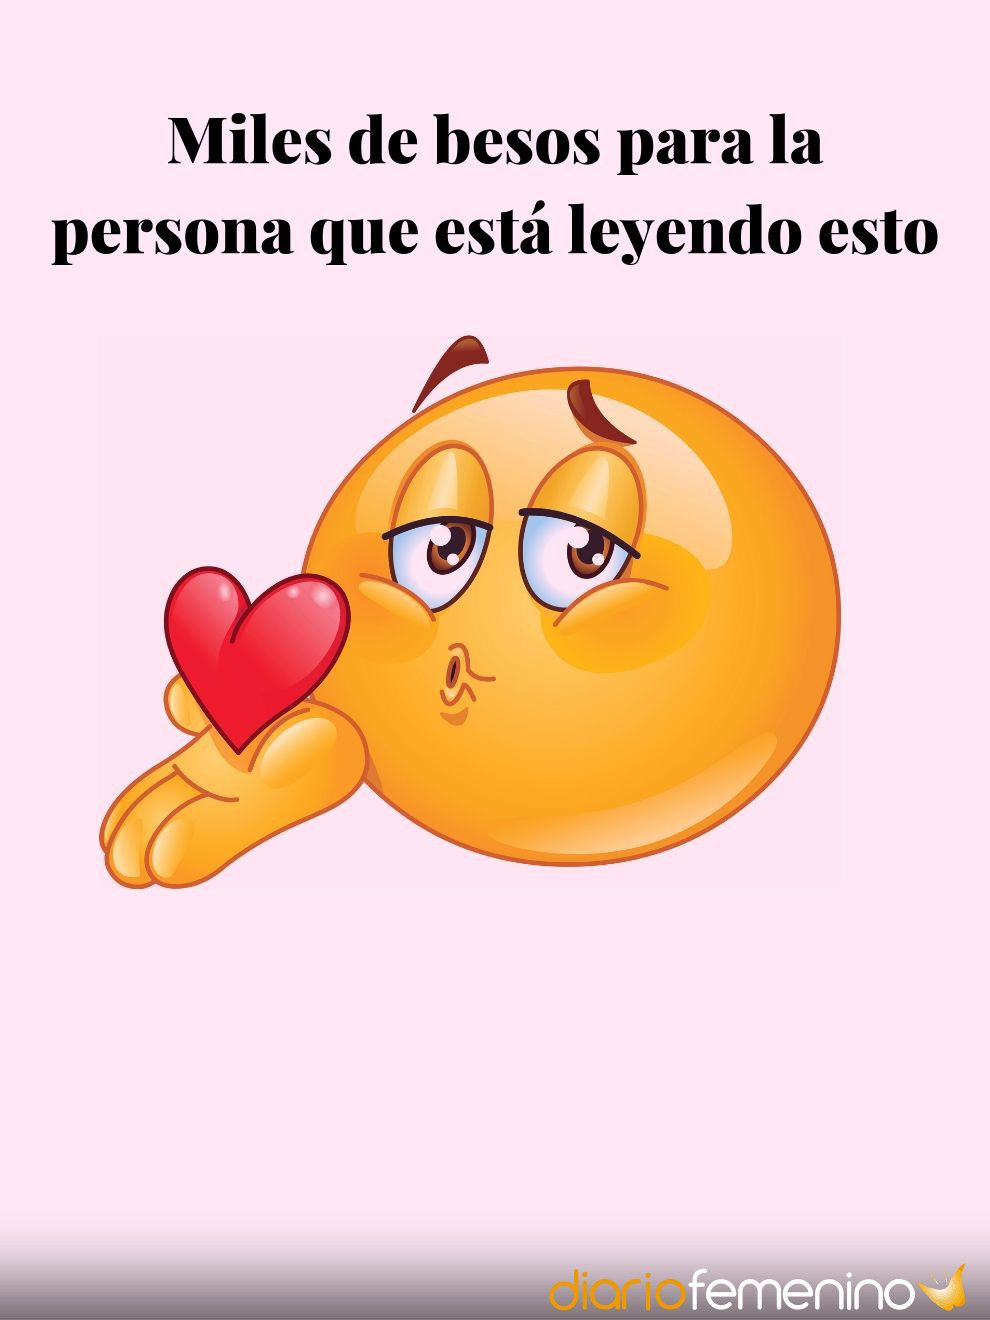 Whatsapp Frases De Amor Con Emoticonos Para Mandar A Tu Novio Mensajes Románticos De Buenos Días Frases Para Ligar Ligar Por Whatsapp